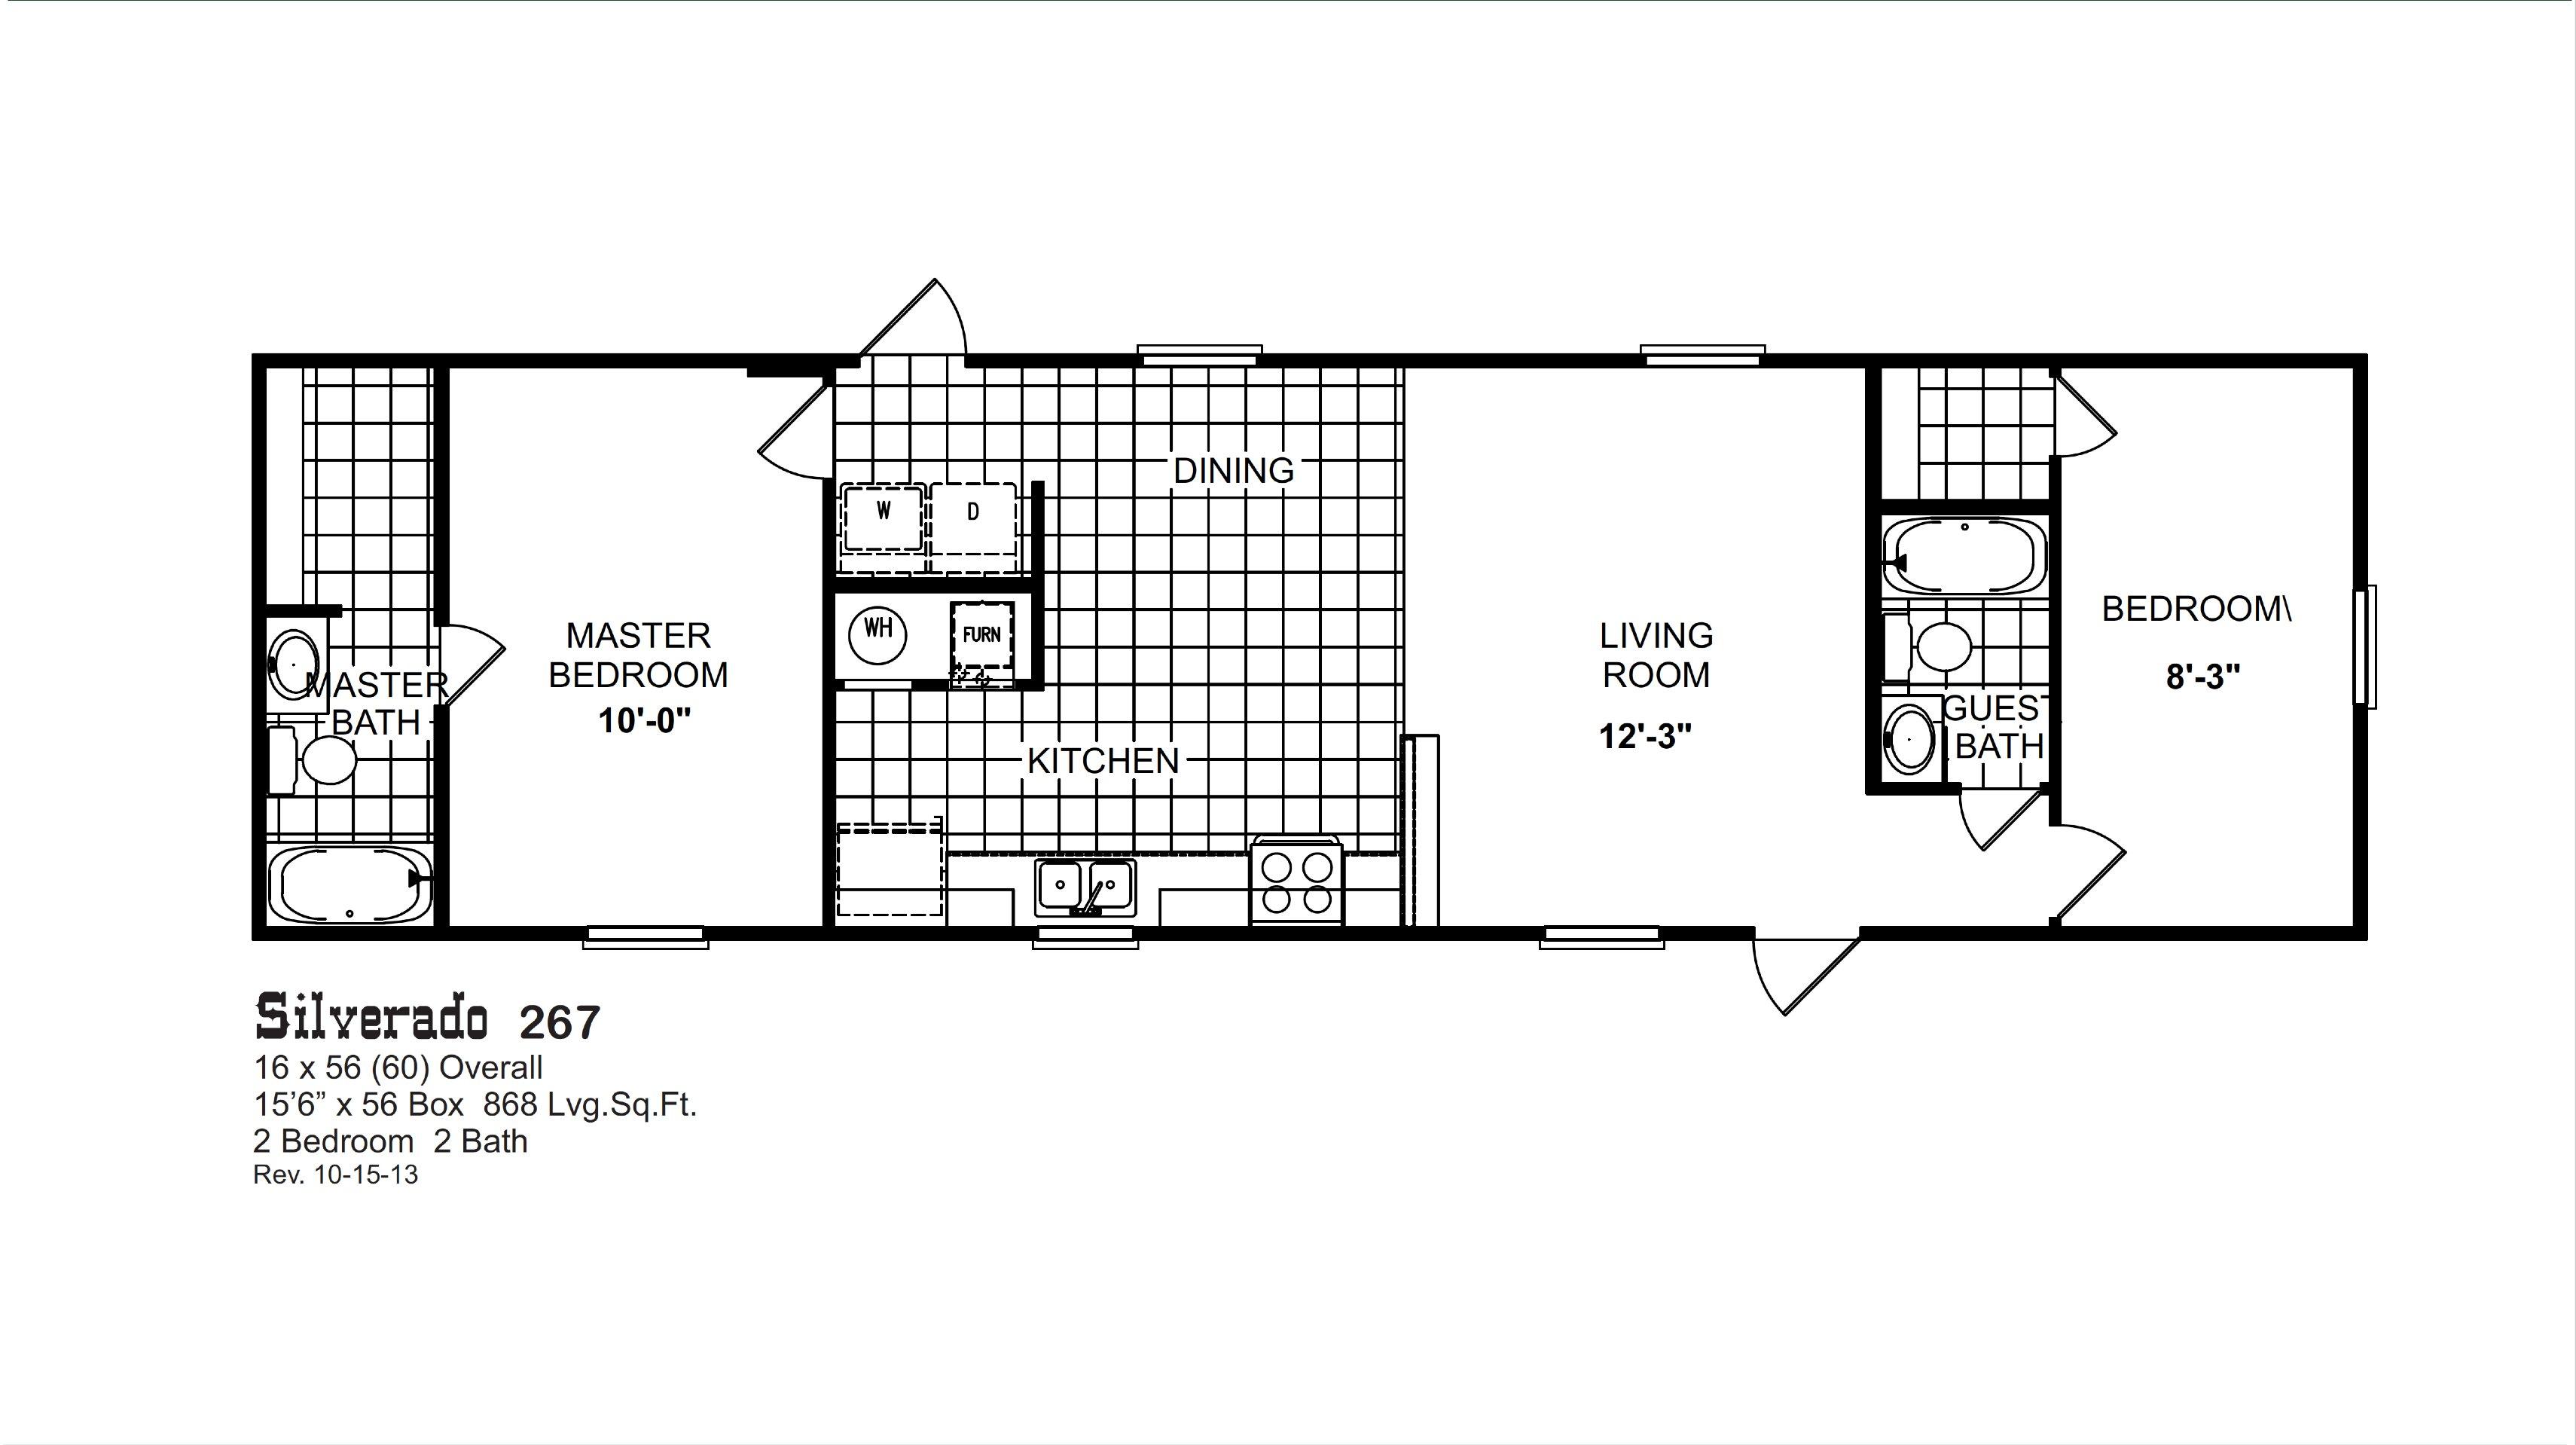 Silverado 267 By Oak Creek Homes